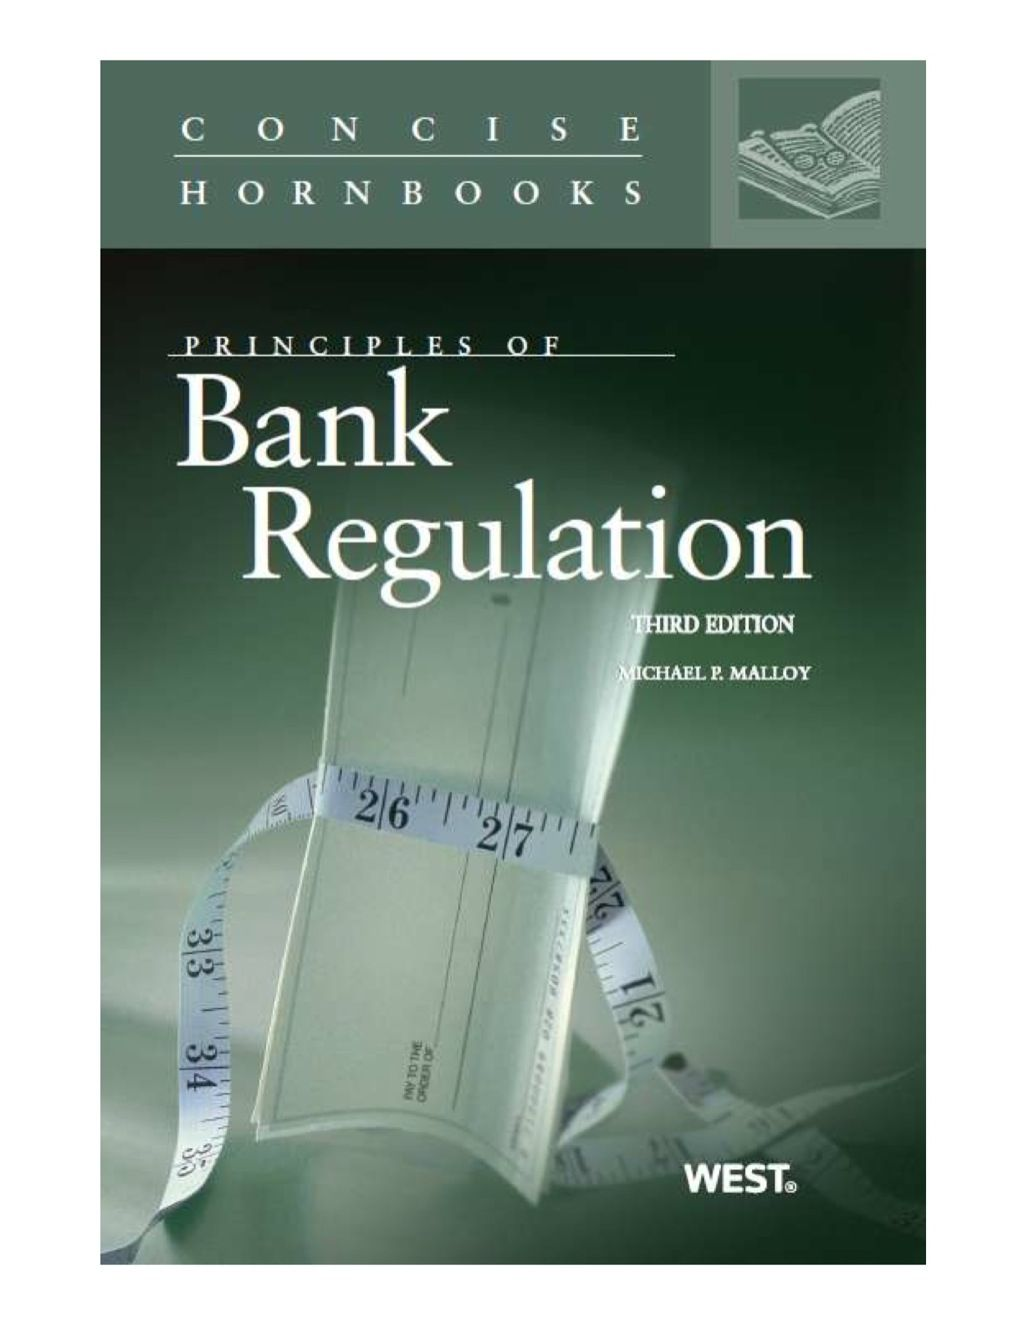 Principles Of Bank Regulation 3d Concise Hornbook Series Ebook